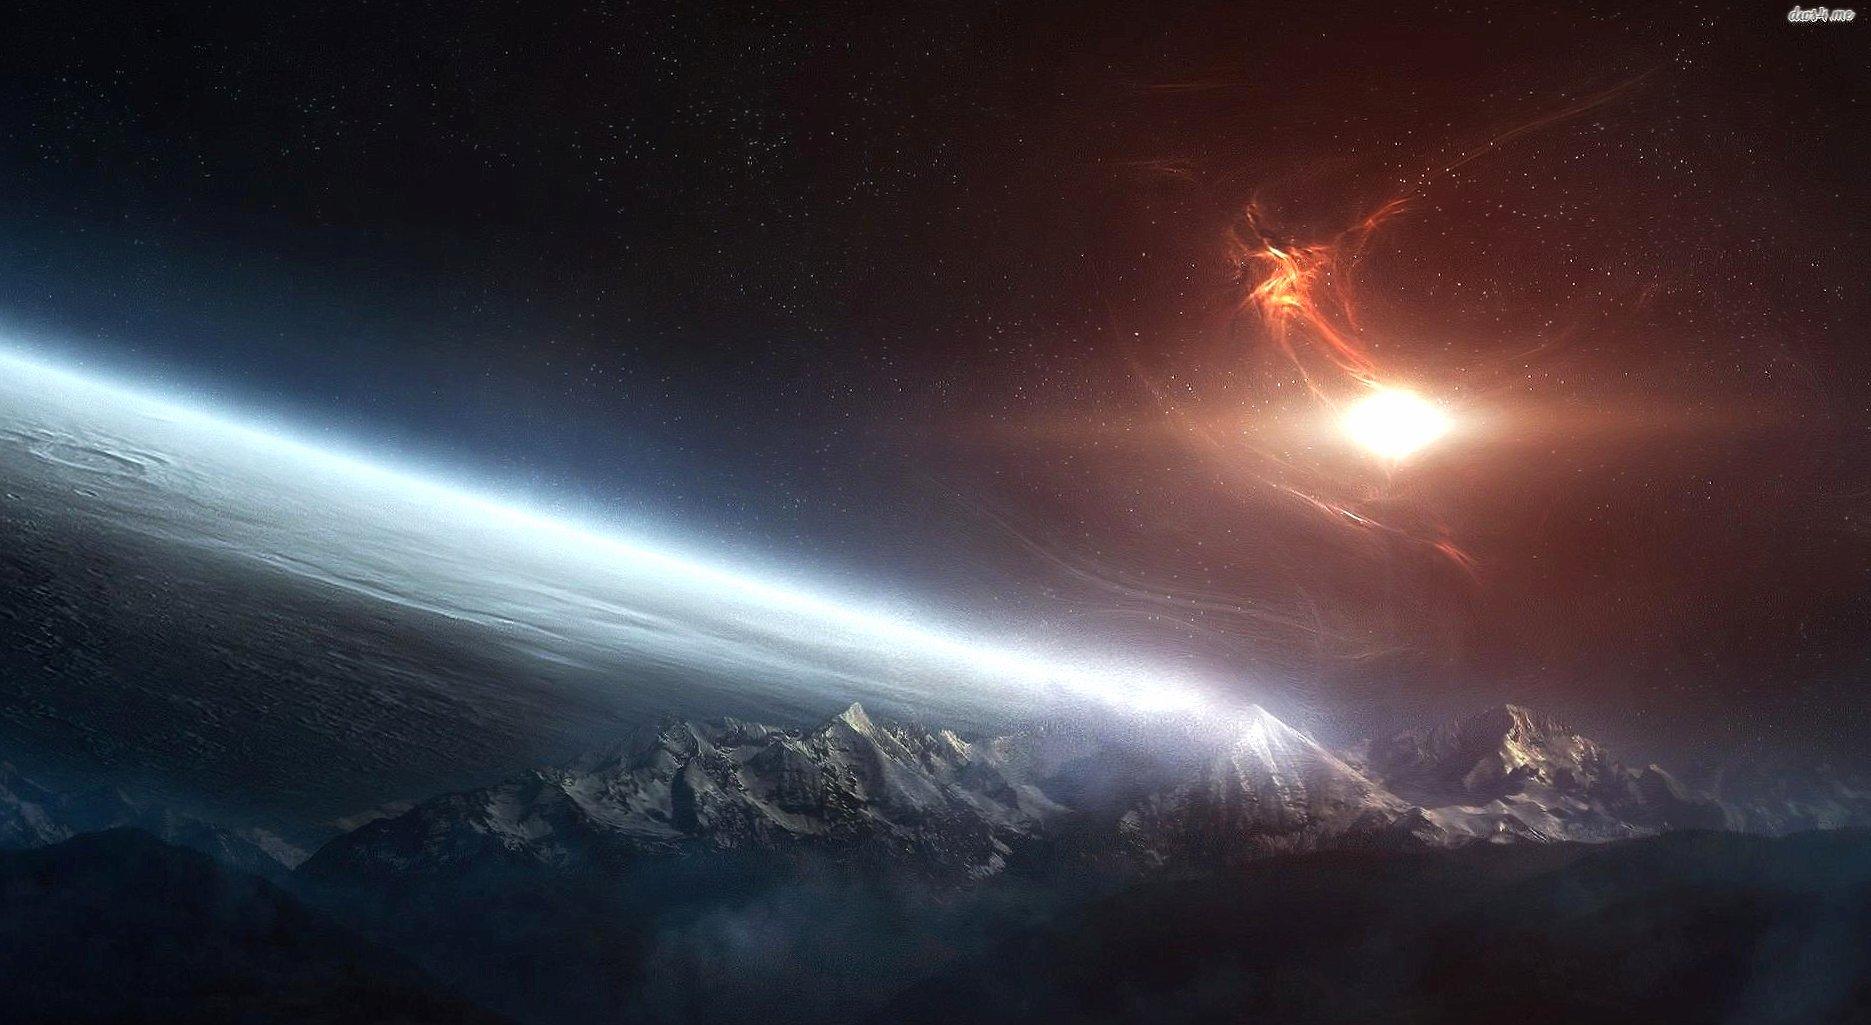 Nebula rise from horizon wallpapers HD quality